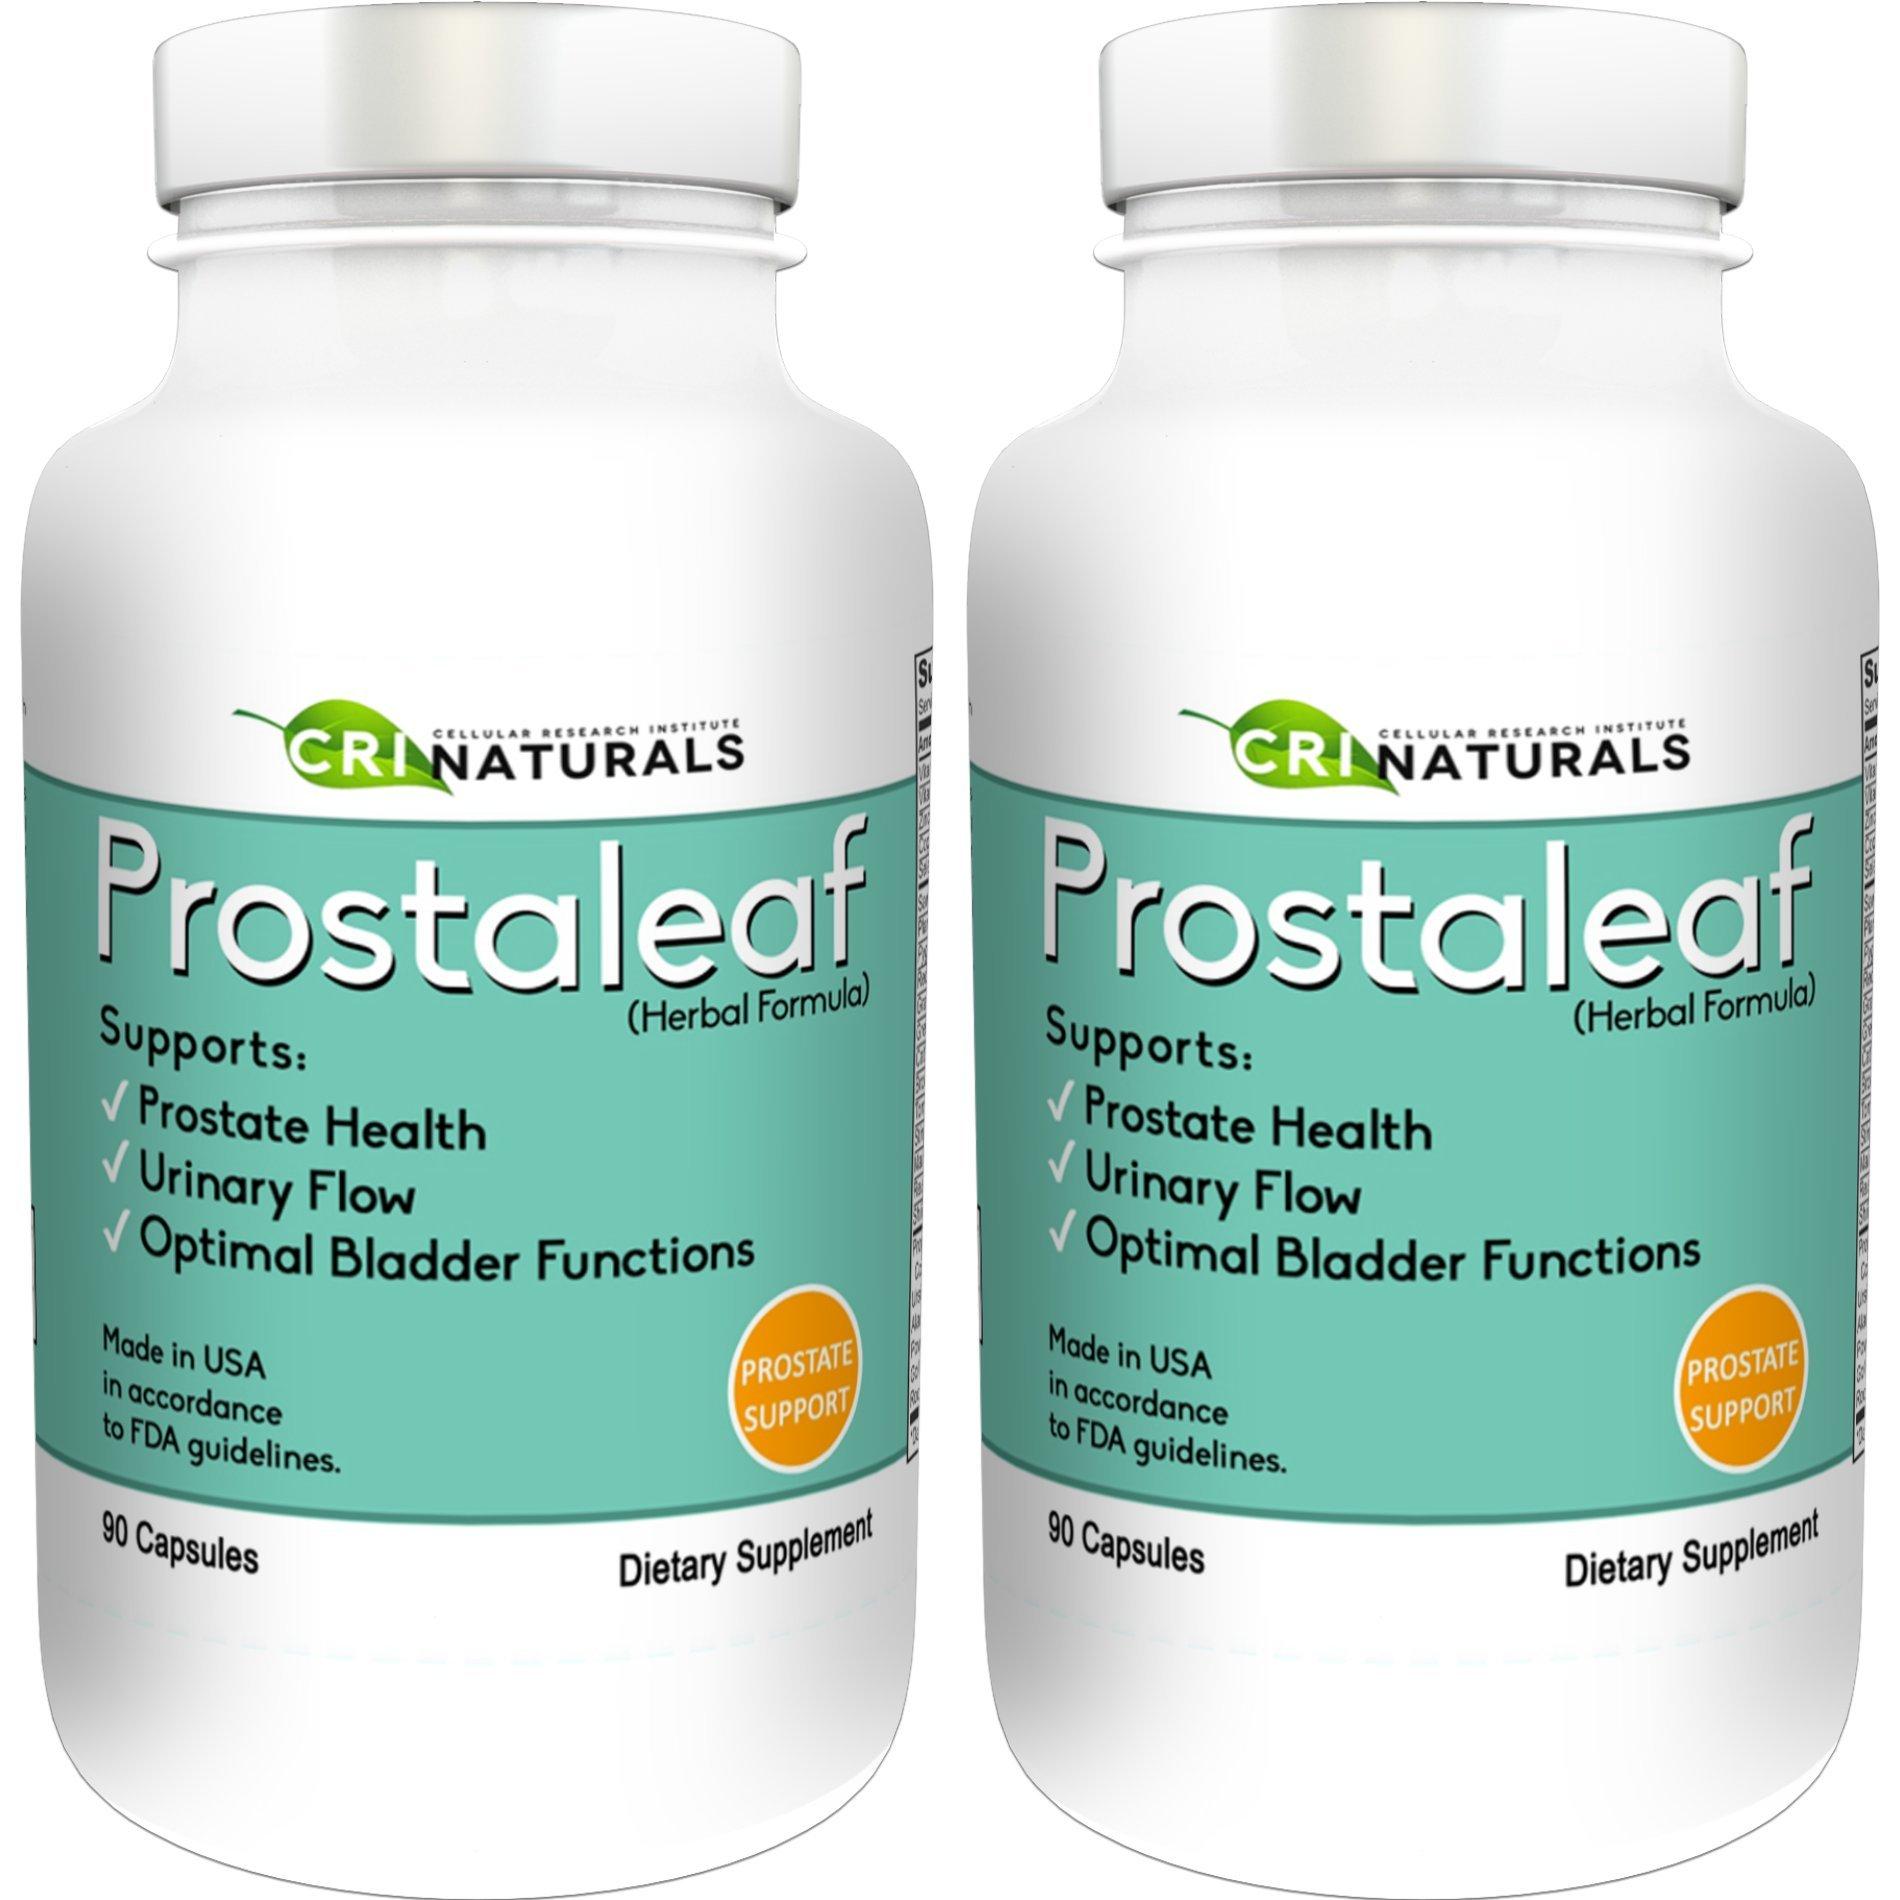 Prostaleaf - Natural Prostate Relief - Prostate Health - Improves Urinary Flow - 90 Money Back Guarantee (2 - pack)